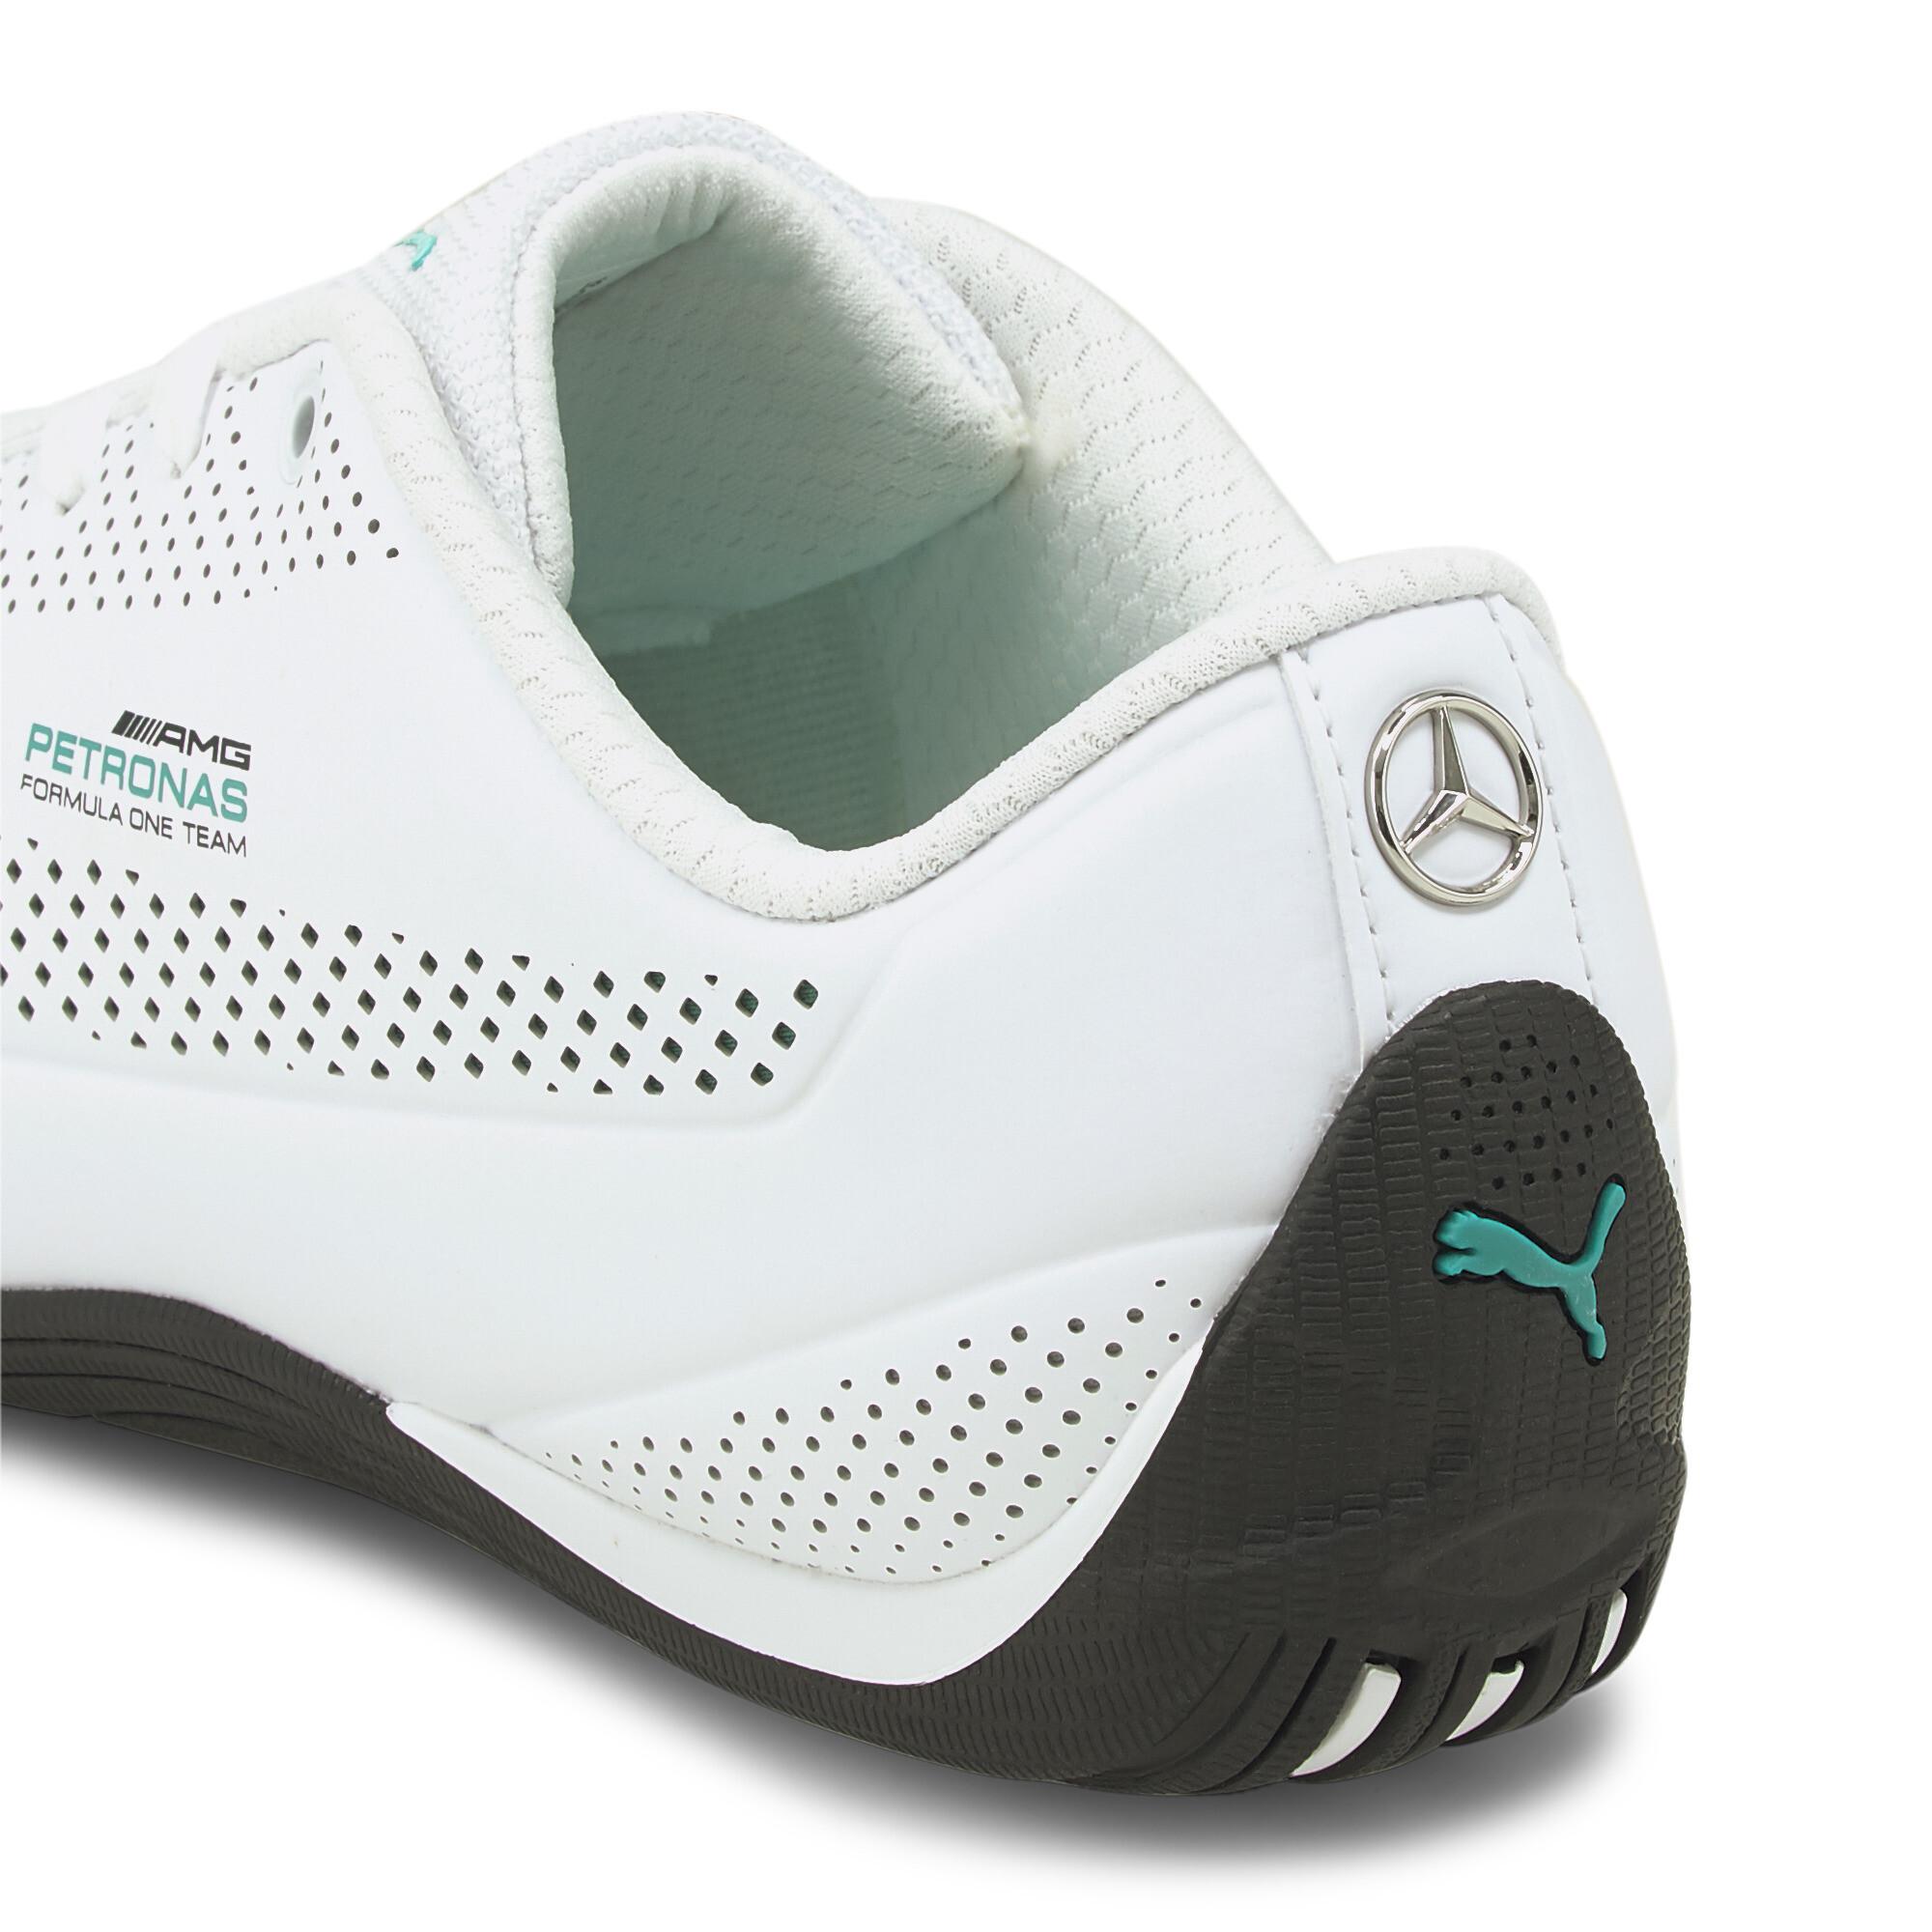 Indexbild 20 - PUMA MERCEDES AMG PETRONAS Drift Cat Ultra Sneaker Unisex Schuhe Neu